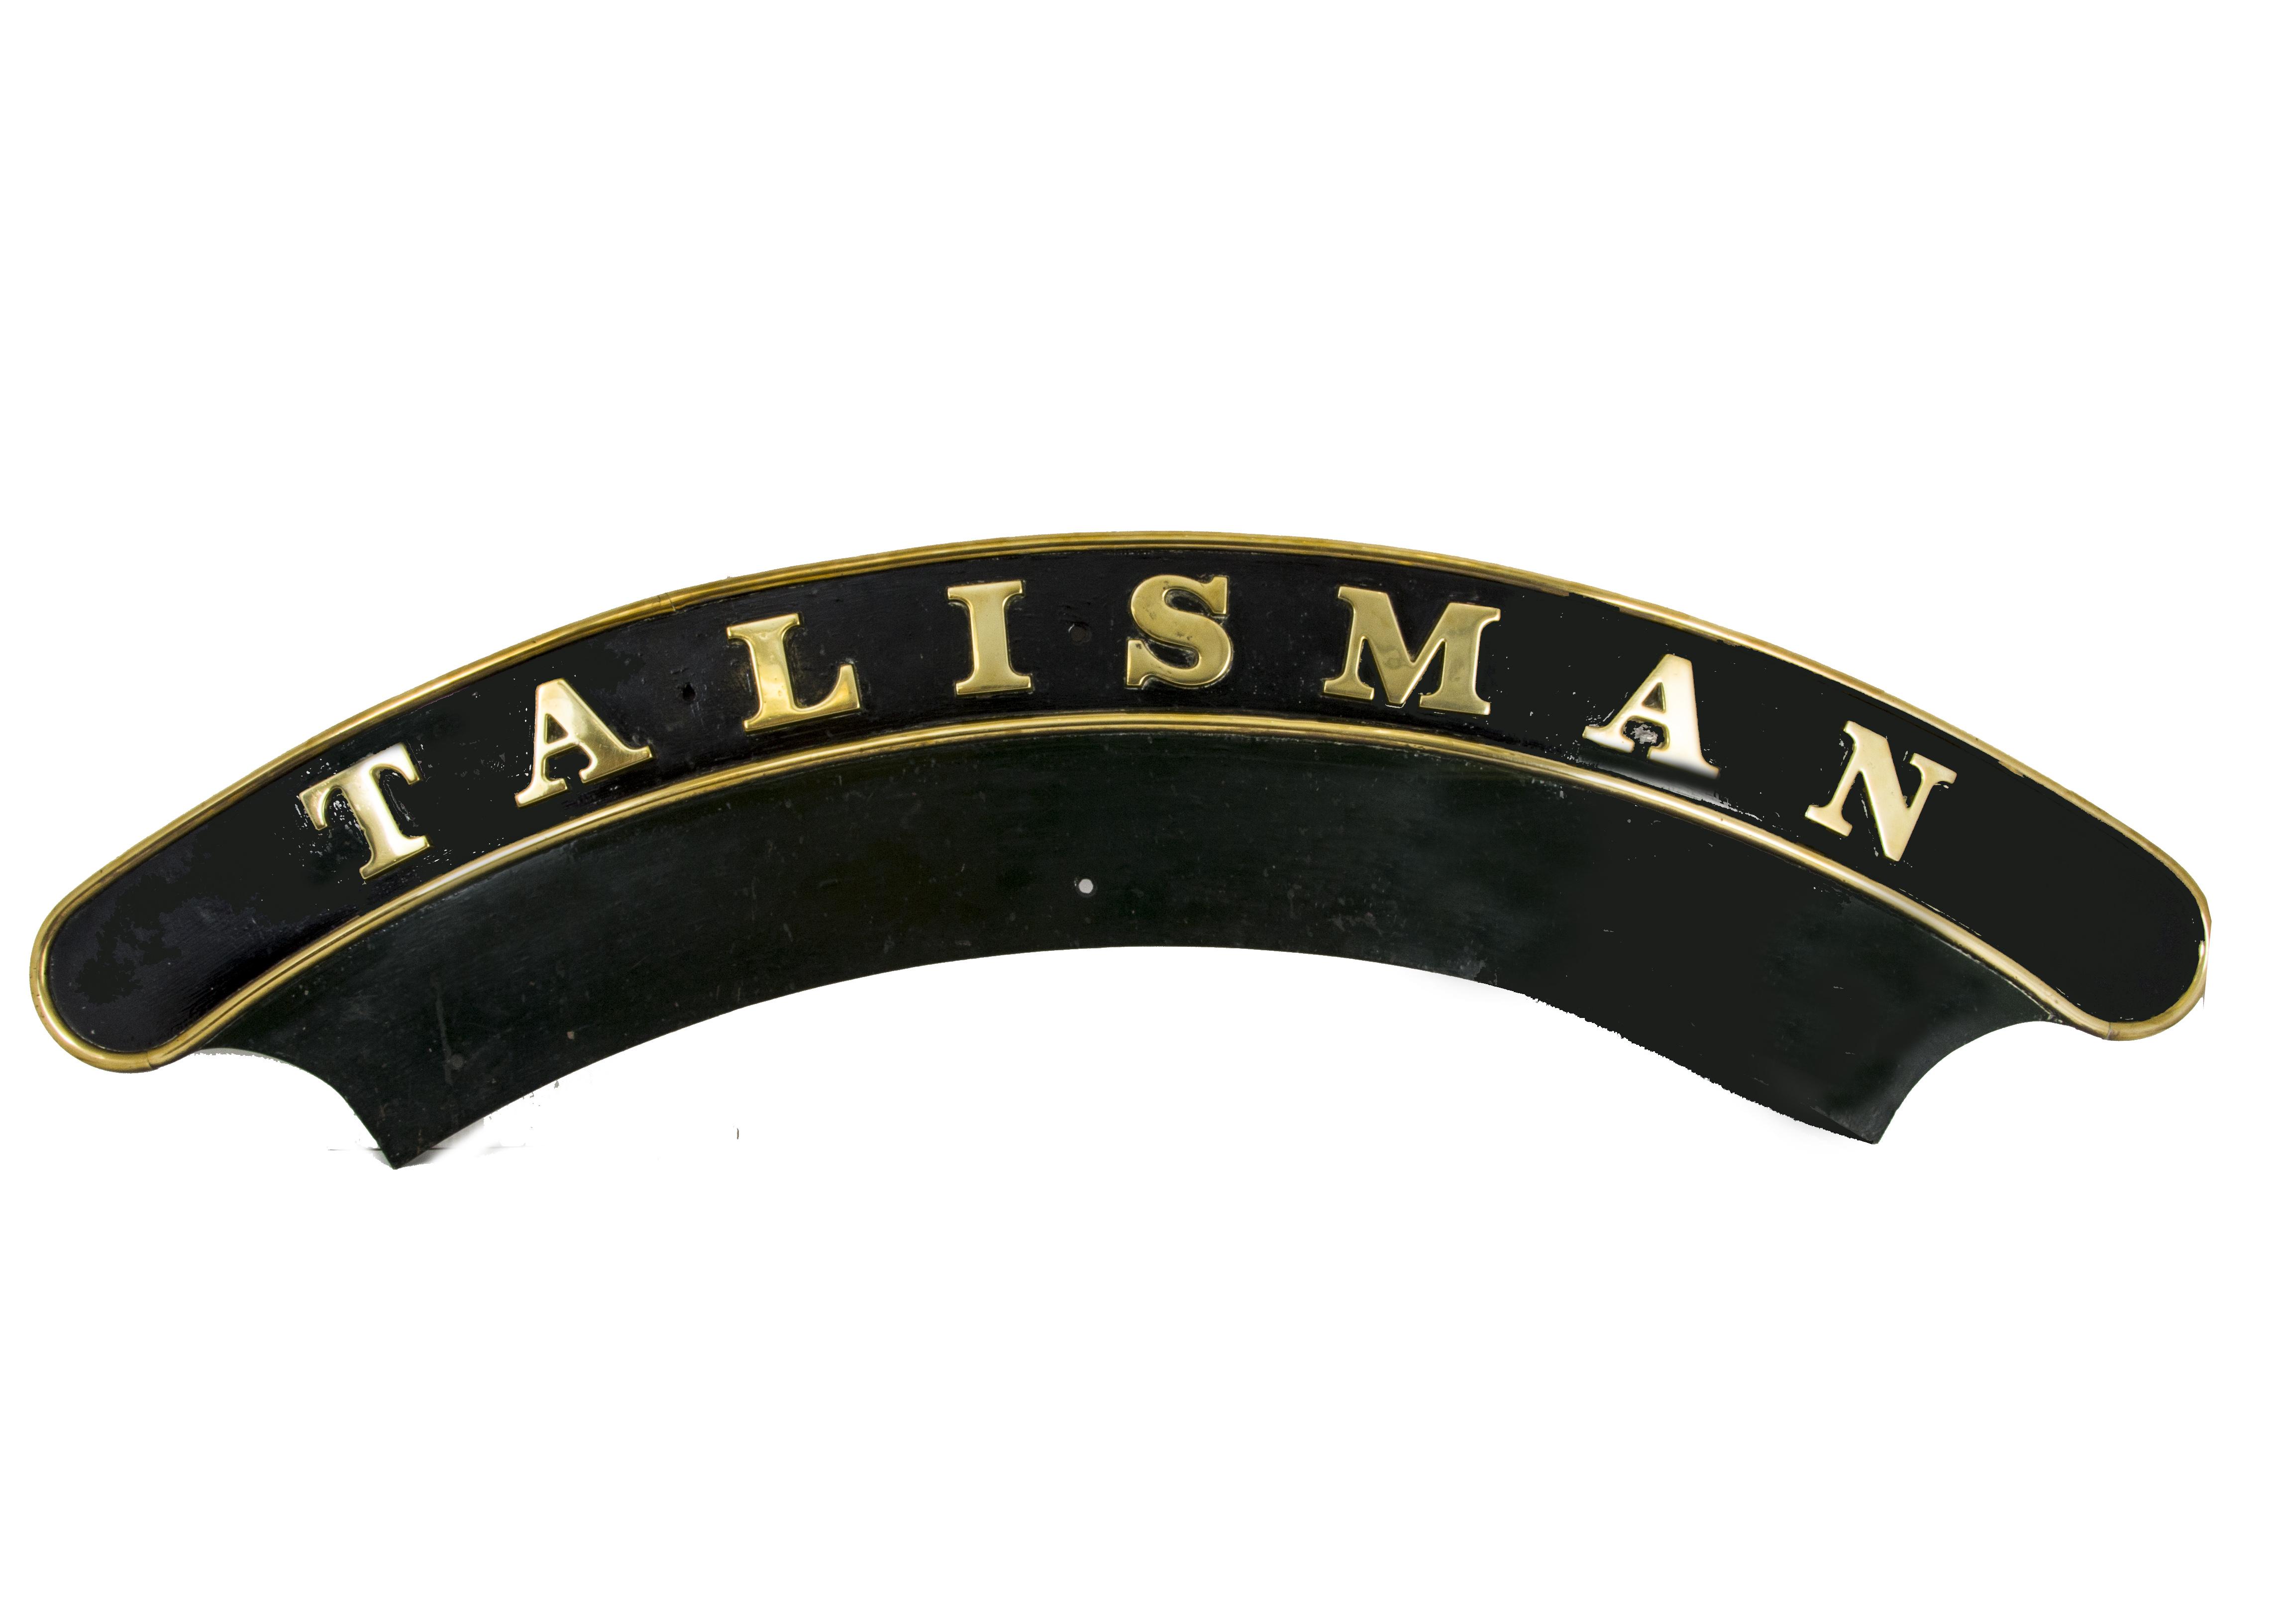 Lot 767 - An Original Great Western Railway 'Saint' Class Locomotive Nameplate 'Talisman', iron and brass,